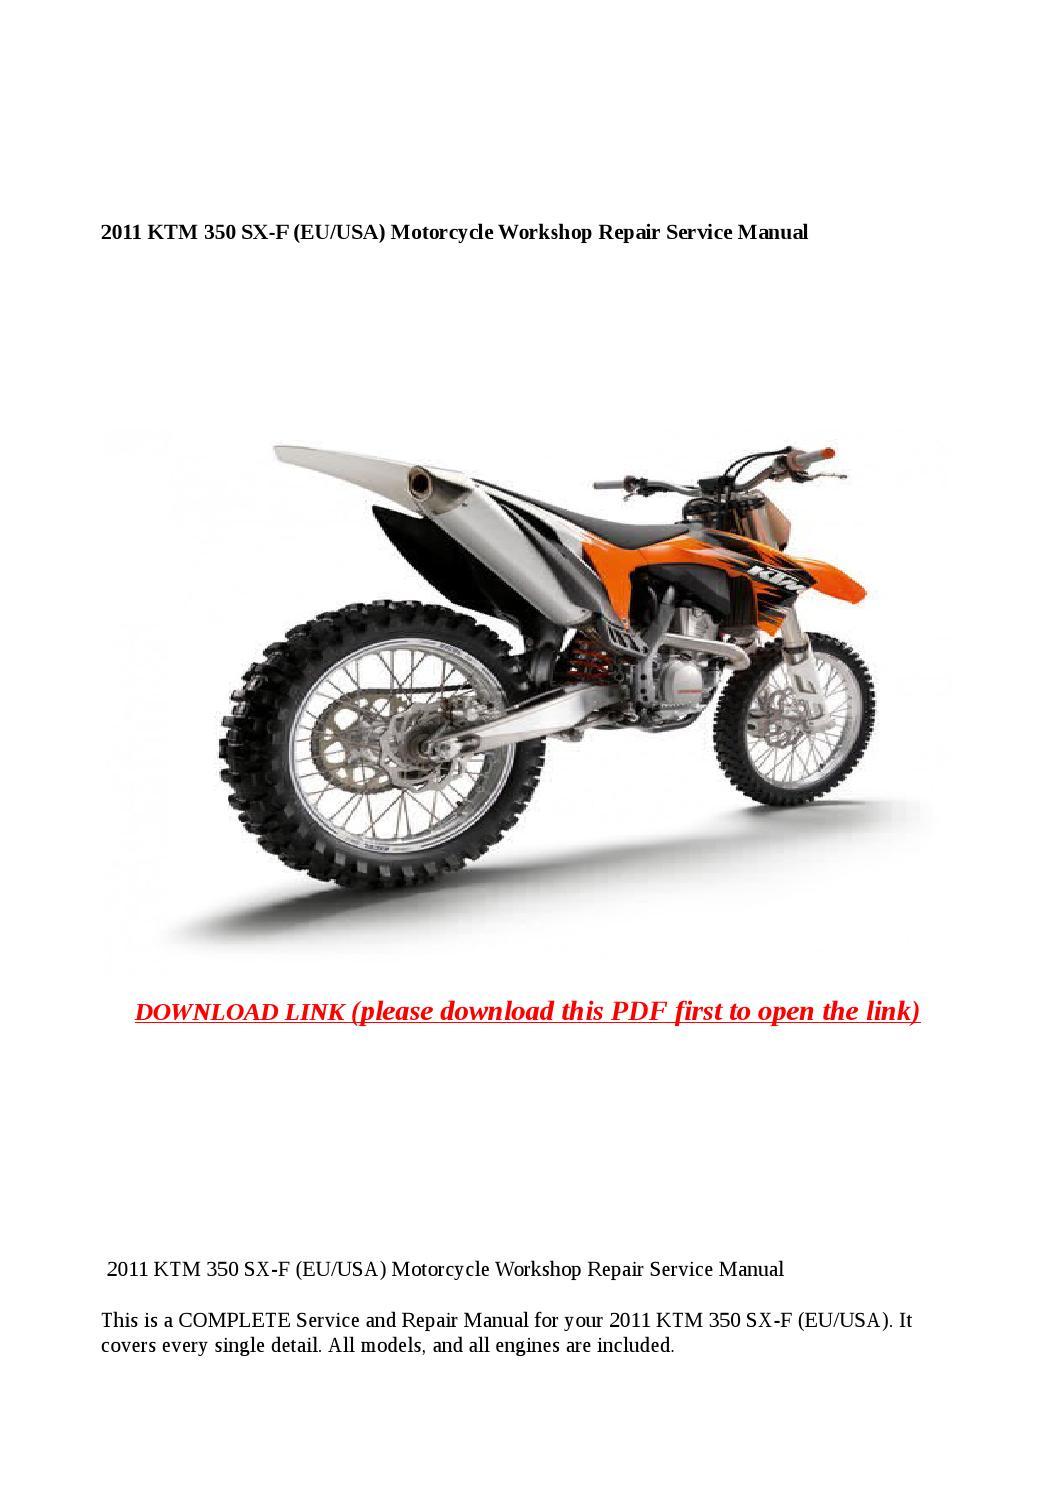 2011 ktm 350 sx f  eu usa  motorcycle workshop repair